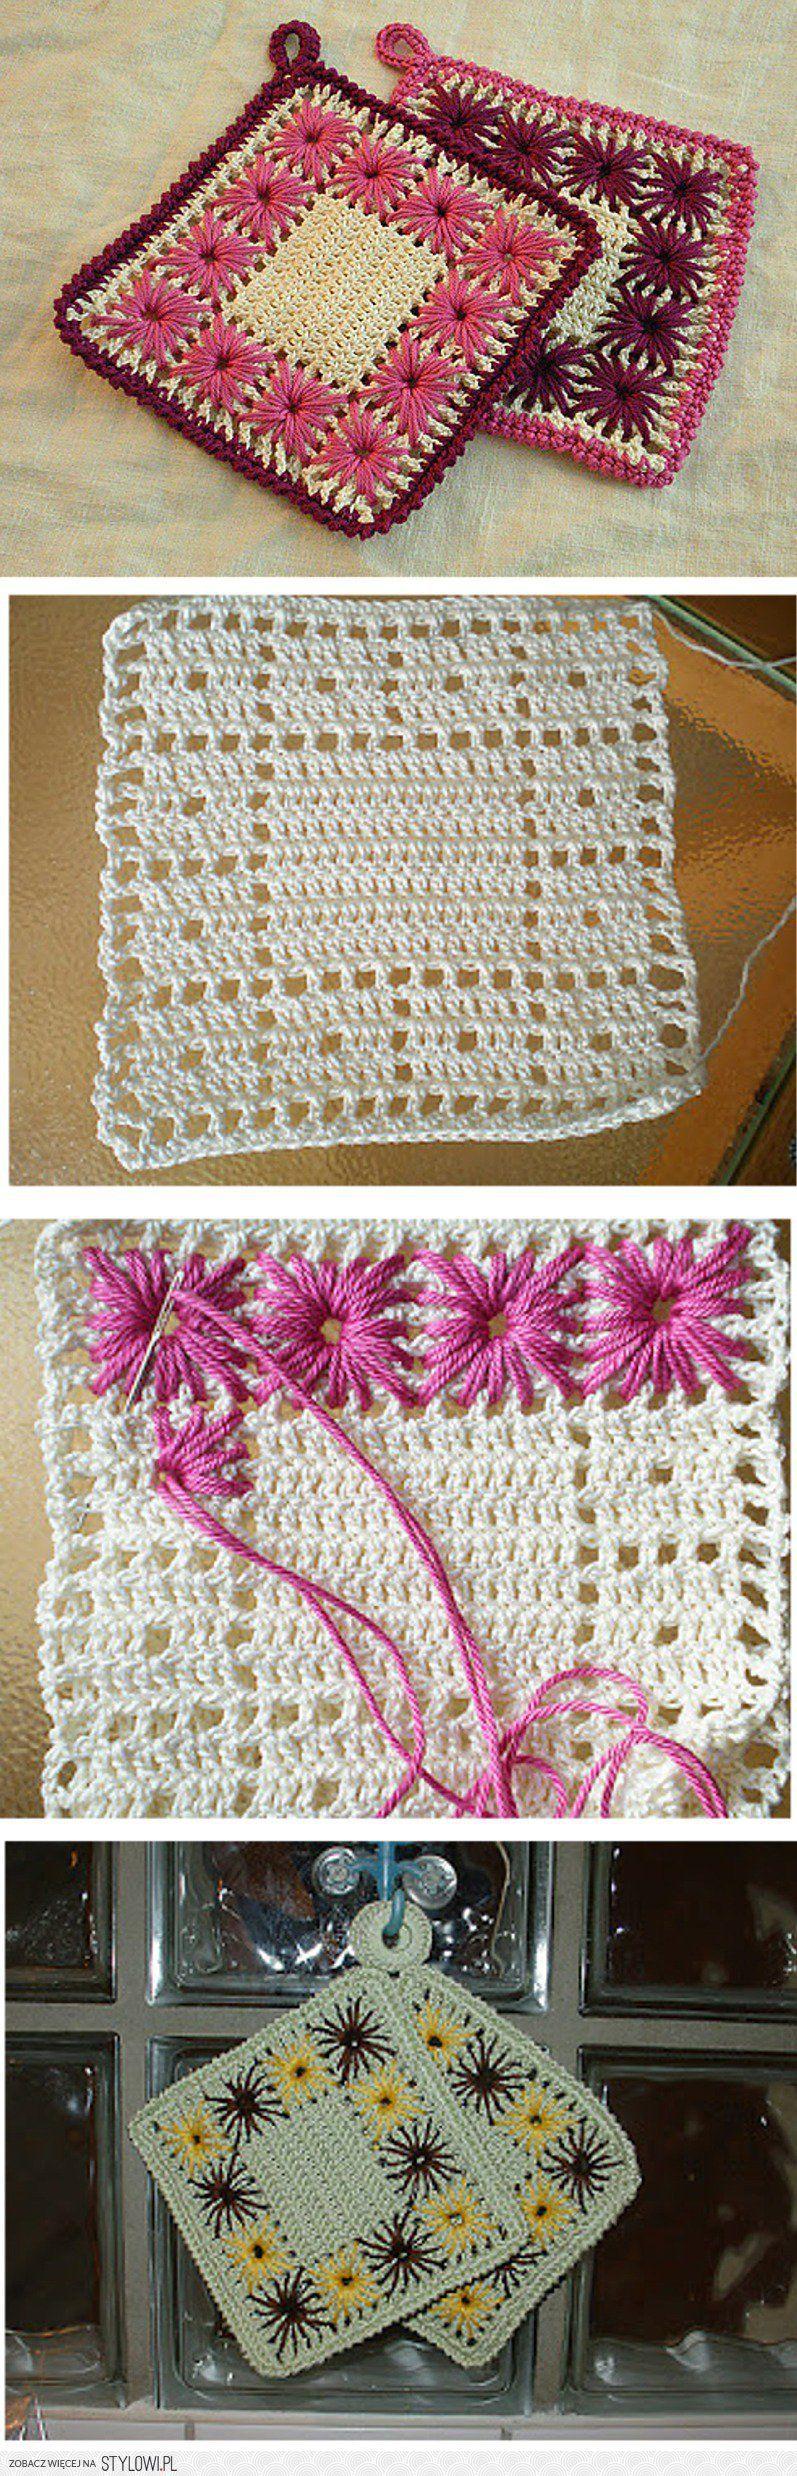 topflappen häkeln - crochet potholder | häckeln | Pinterest ...